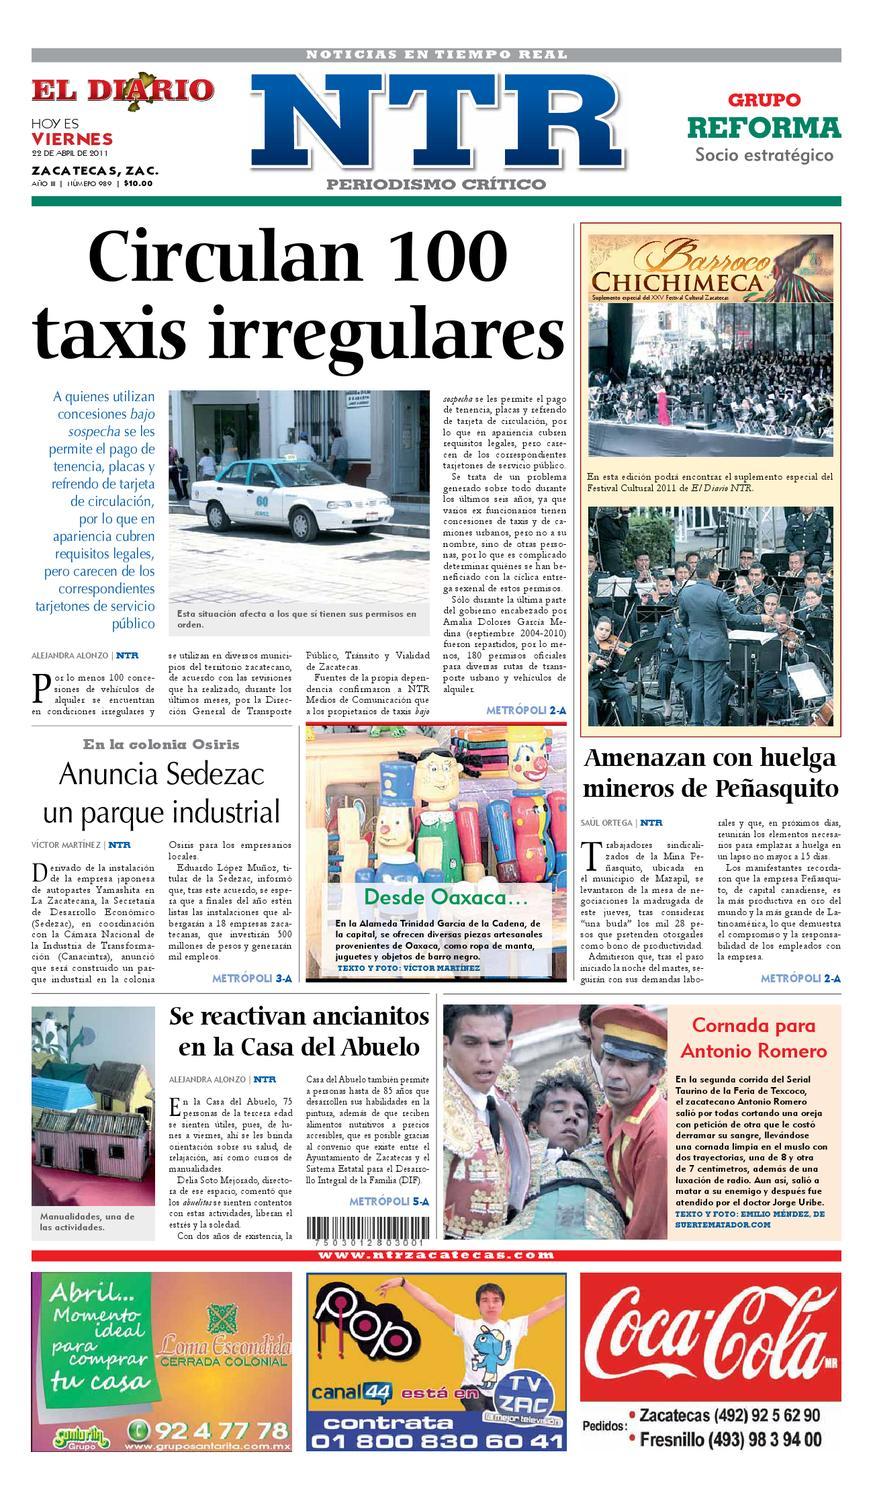 Ruleta de premios gratis celulares comprar loteria en Juárez-341363